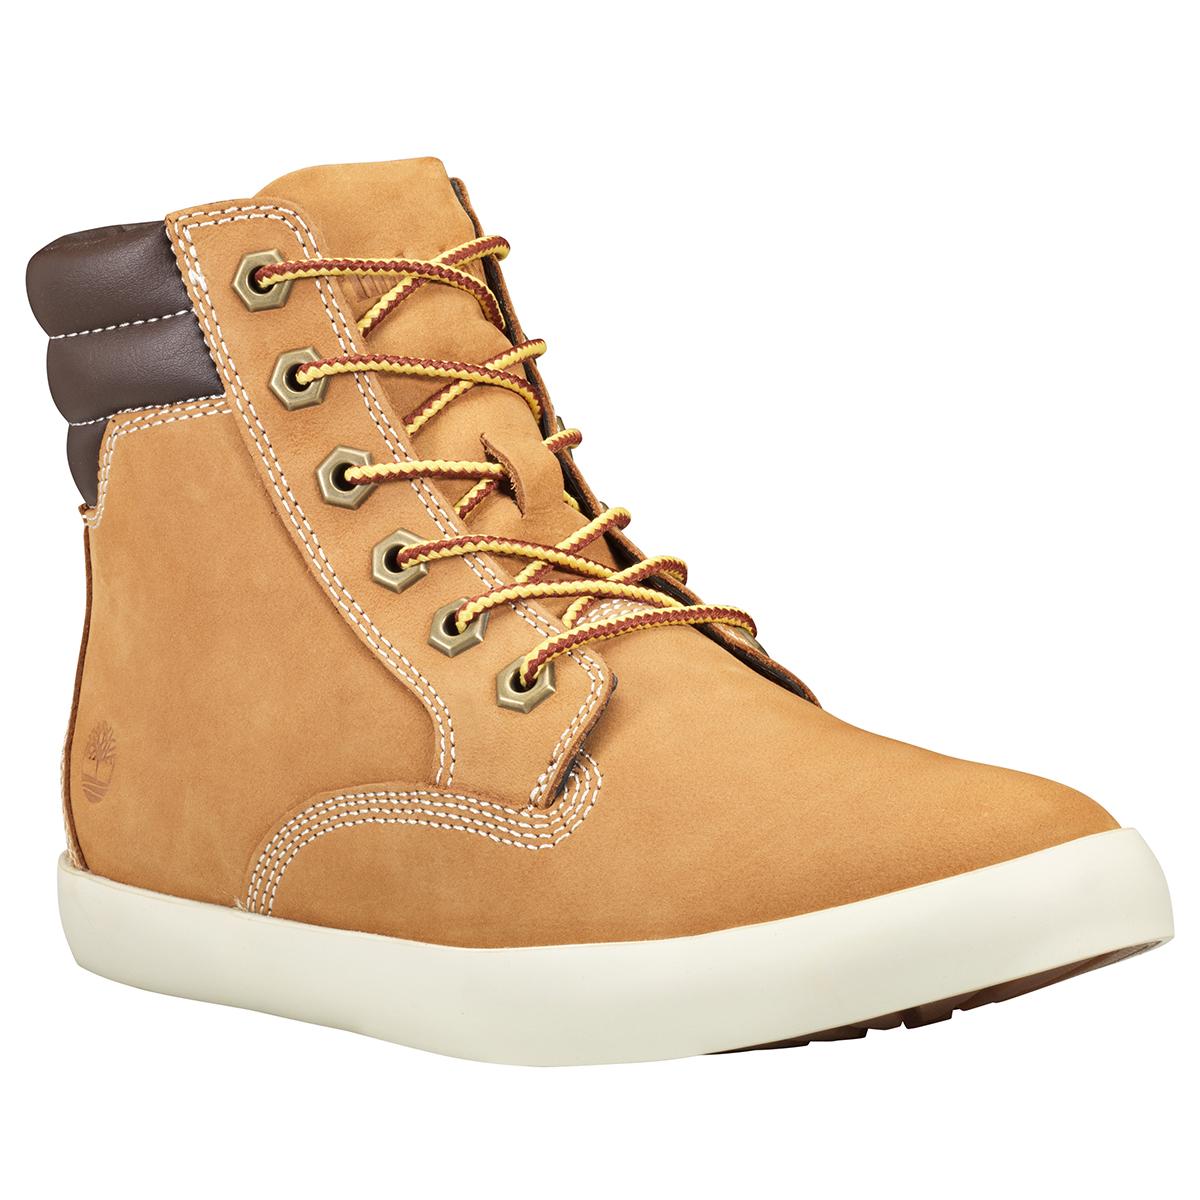 Timberland Women's Dausette Sneaker Boot - Brown, 8